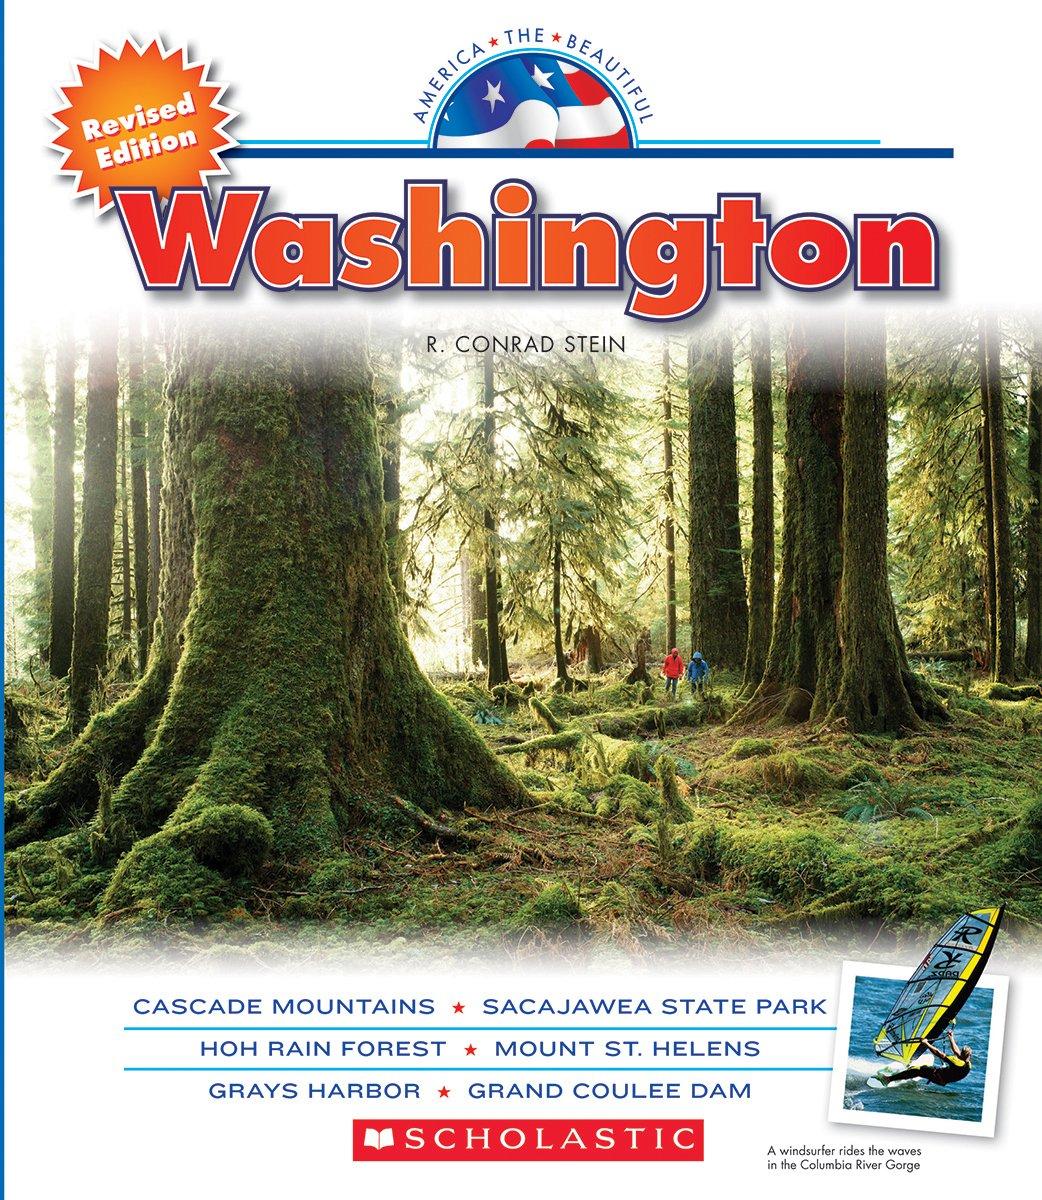 Washington America the Beautiful Third Series  ebook by R. Conrad Stein